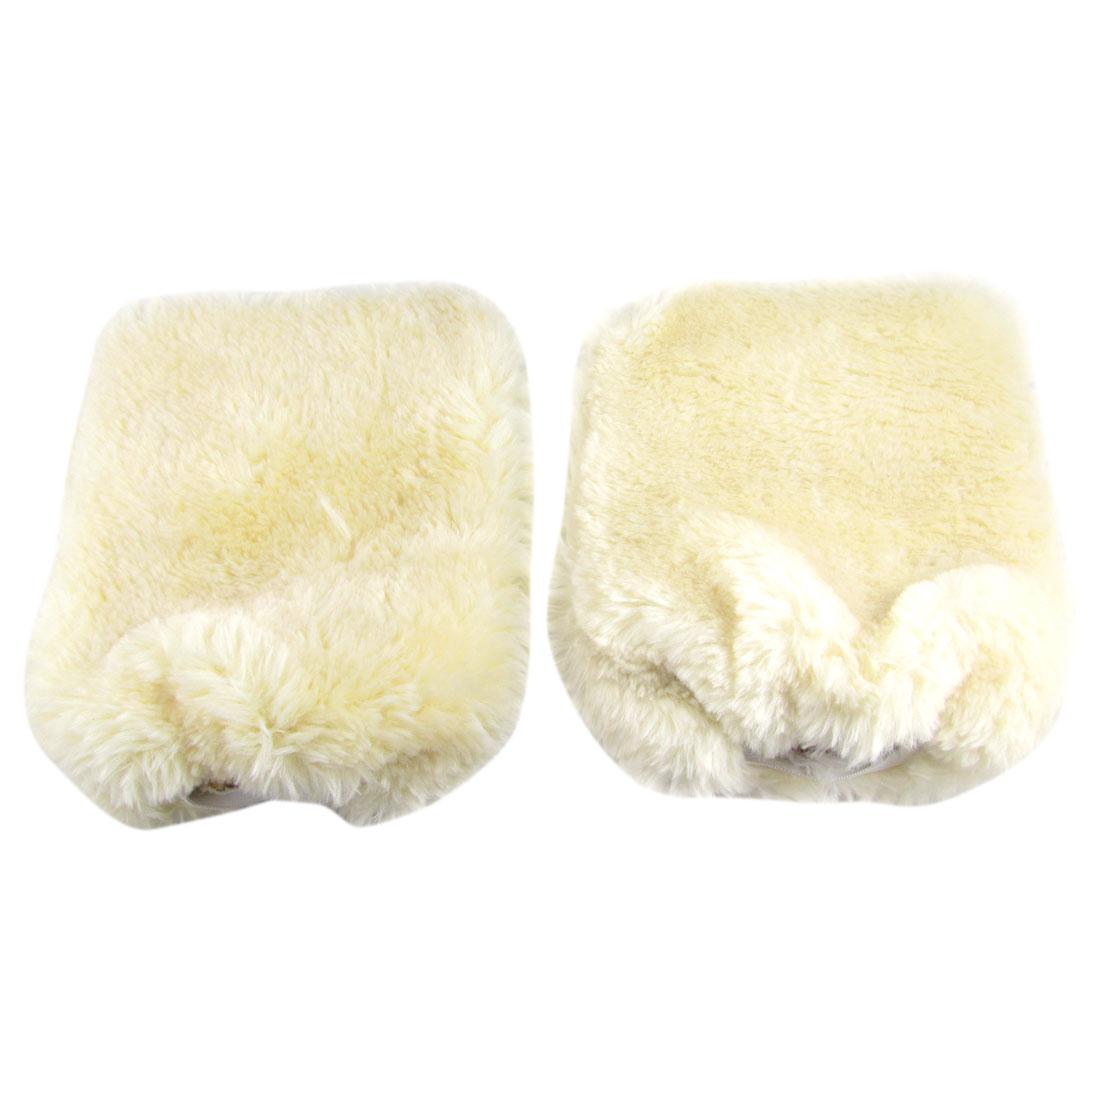 Elastic Cuff Auto Car Cleaning Washing Gloves Mitt Beige Pair